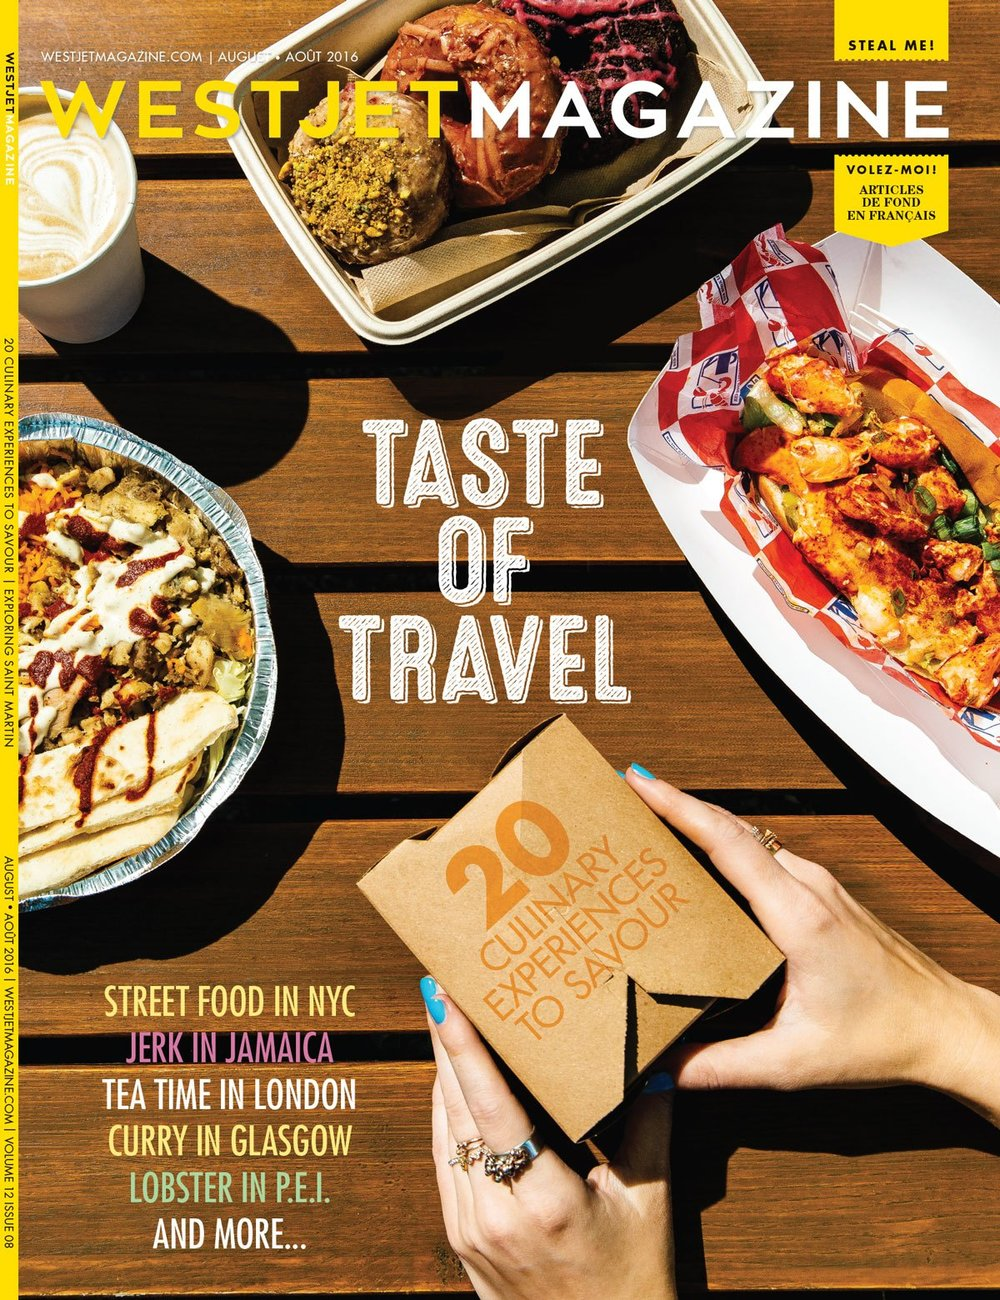 travel-photographer-westjet-magazine-august-2016-.jpg